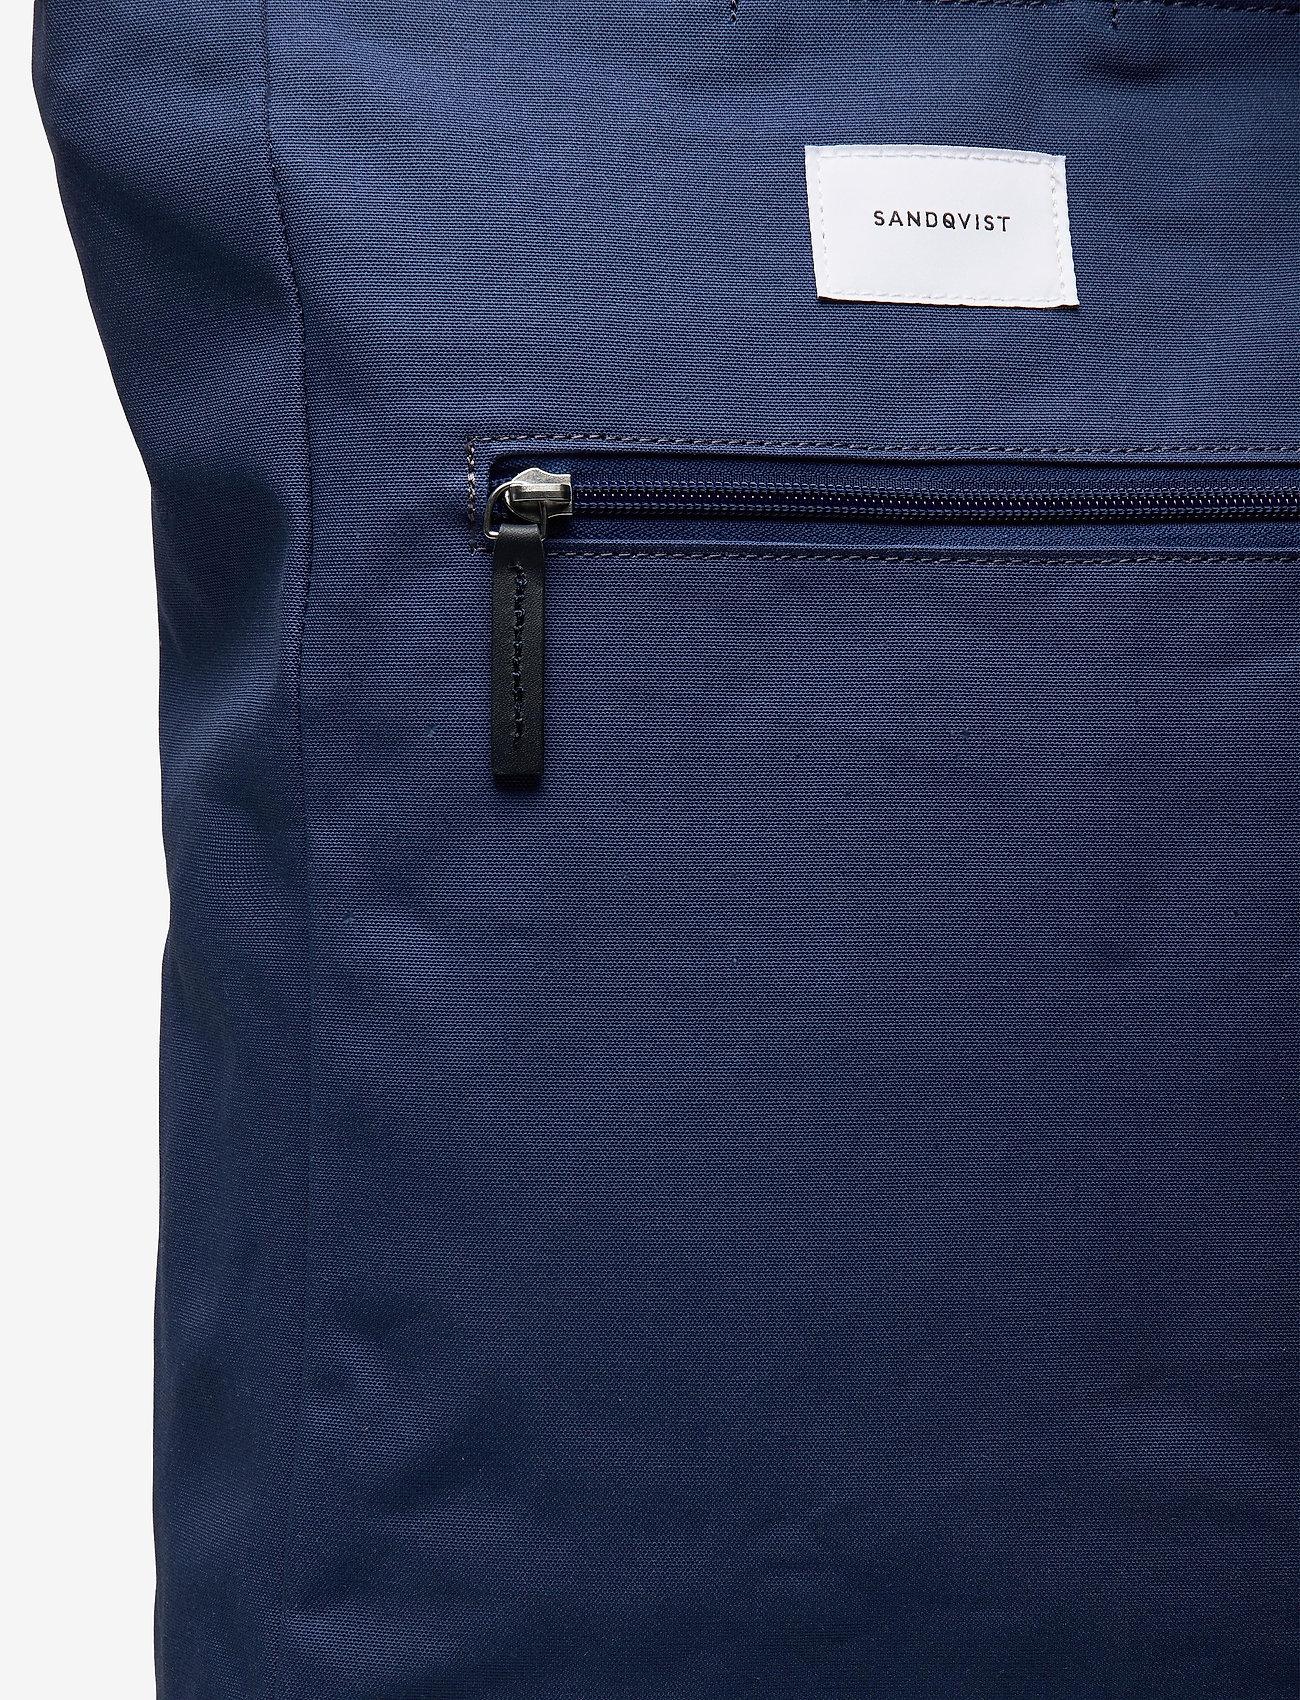 SANDQVIST - TONY - sacs a dos - blue with blue leather - 3